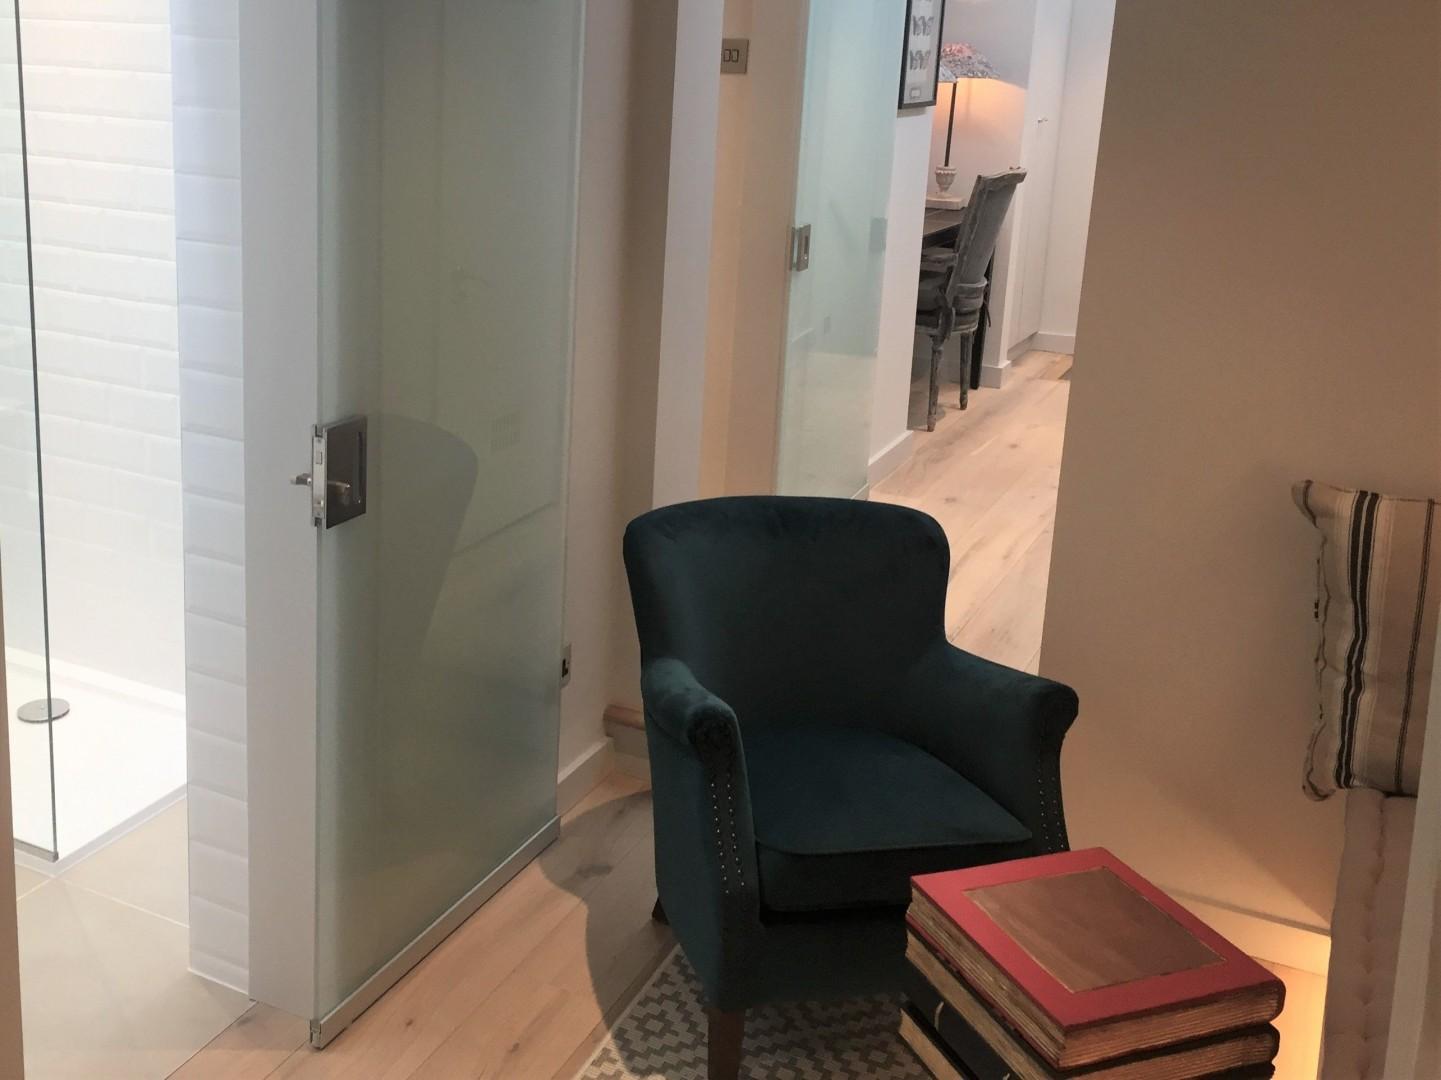 Cozy bathroom next to the sitting area